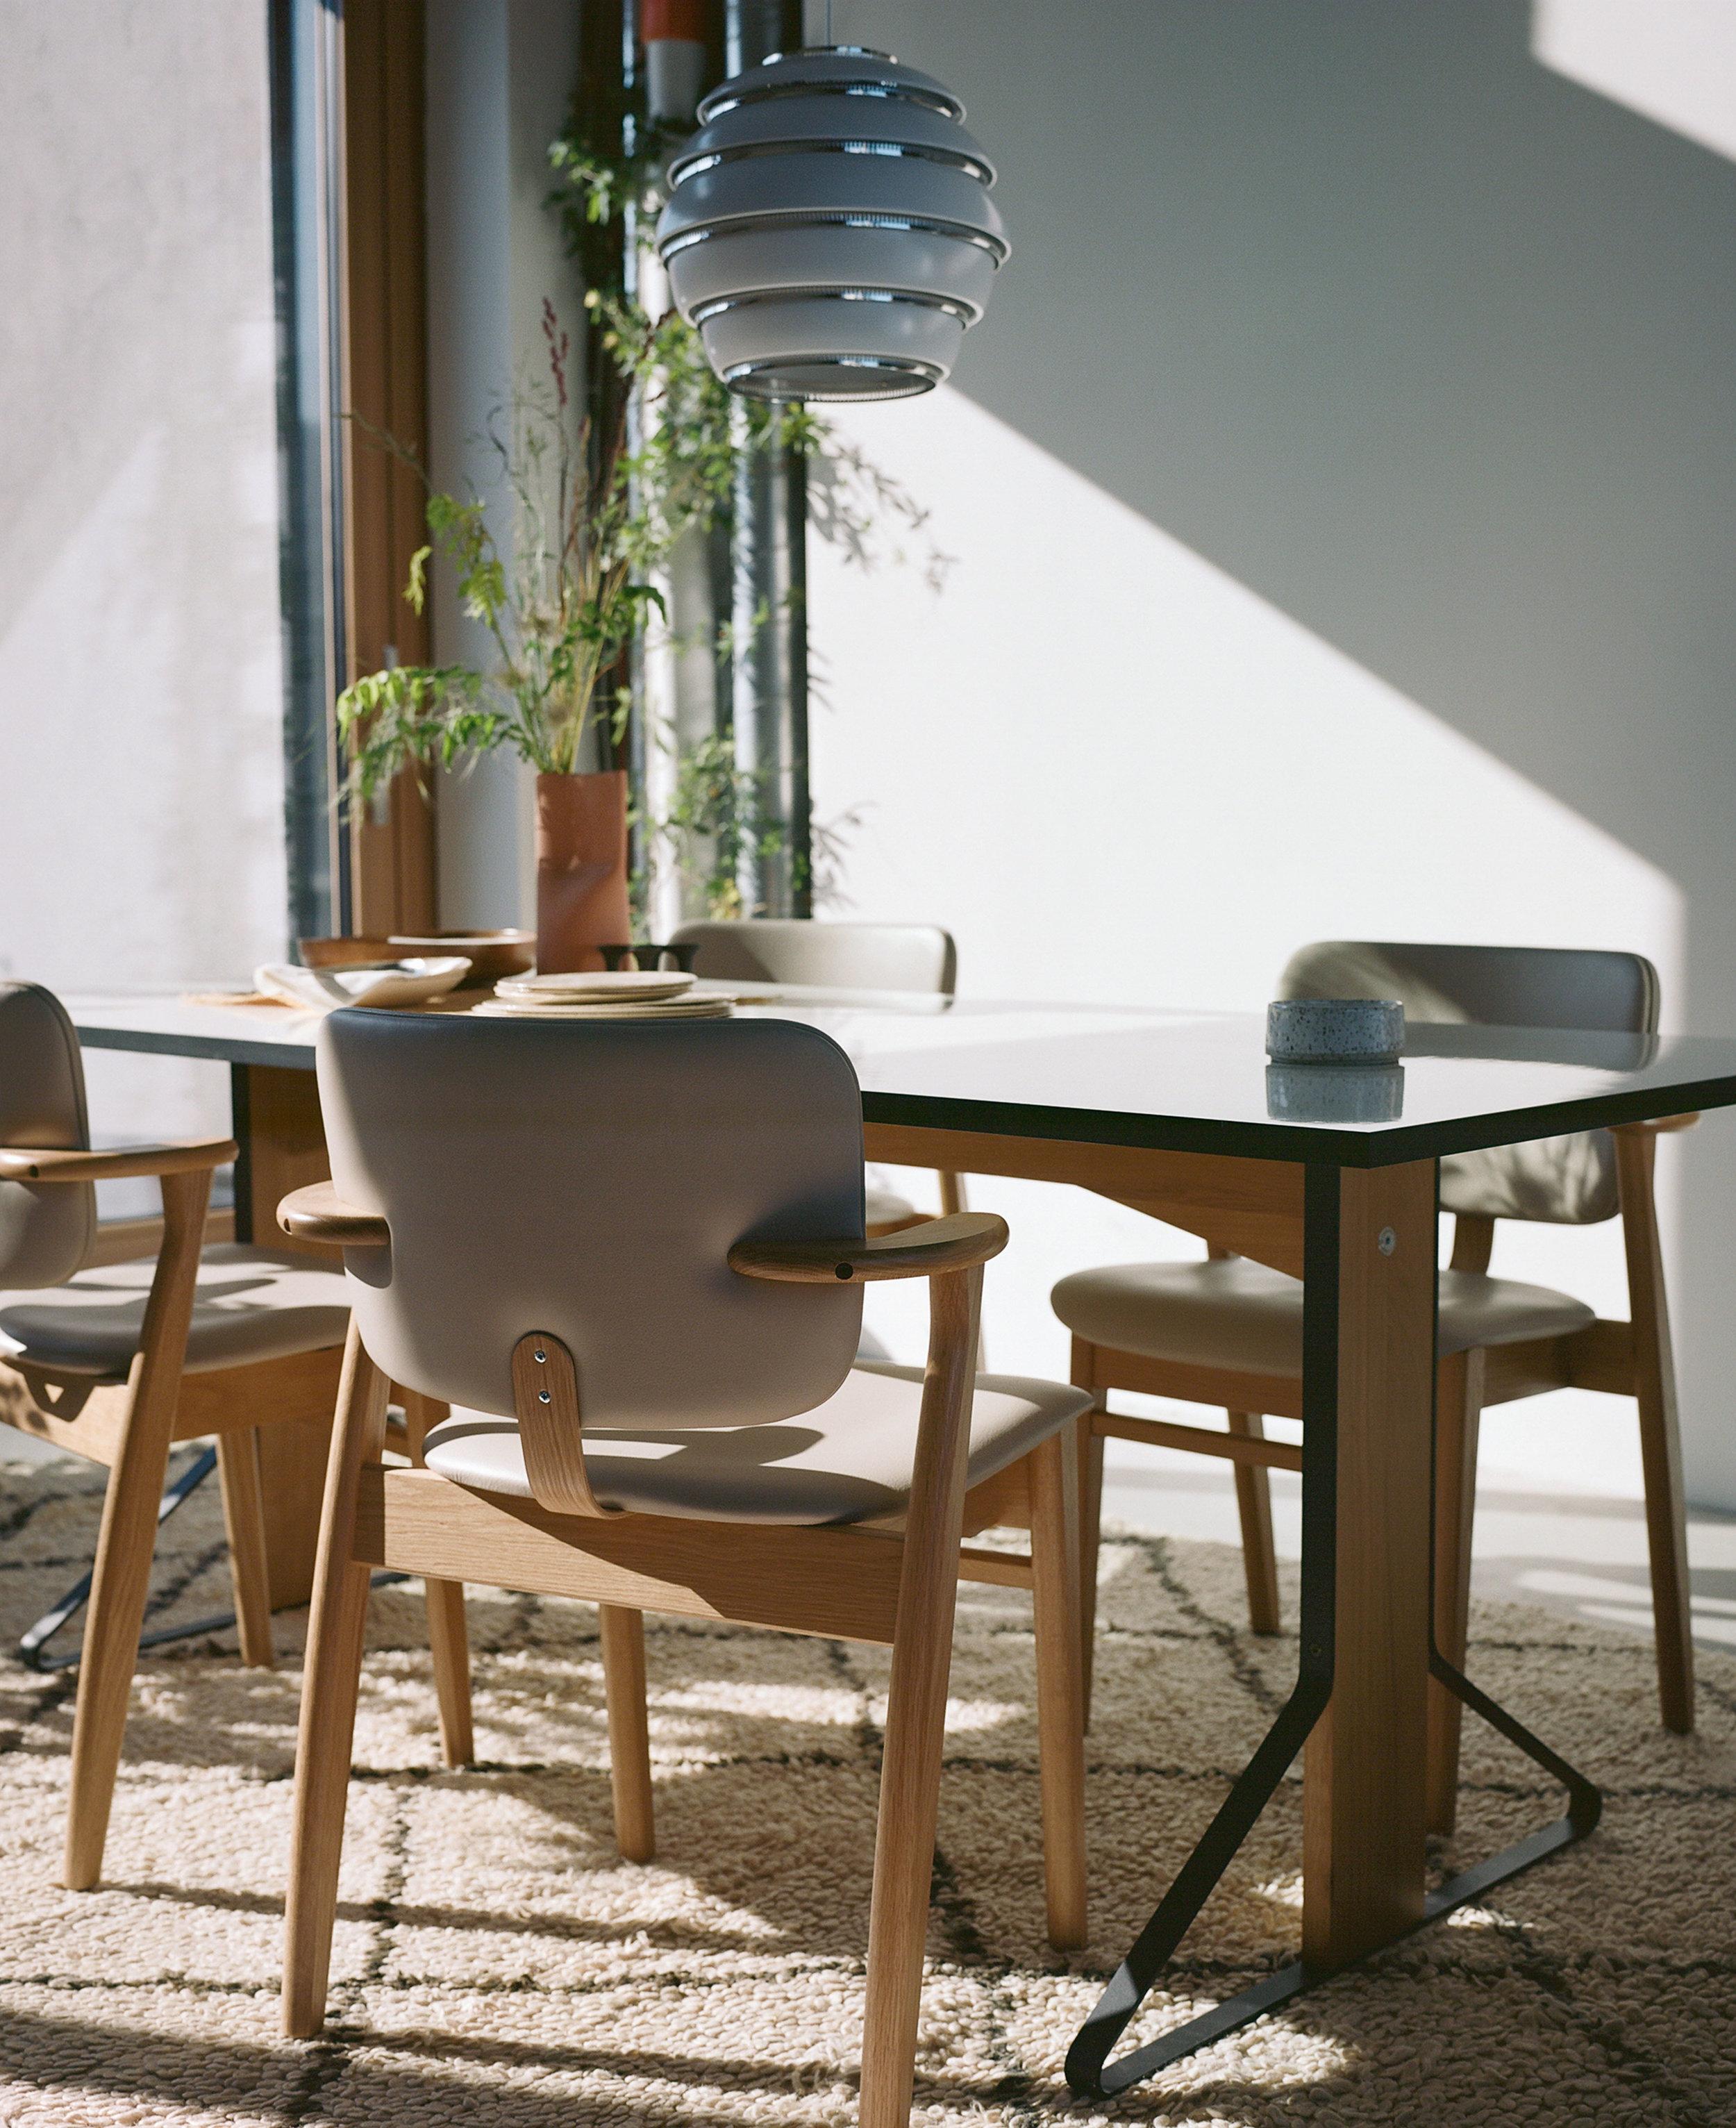 Domus_Chair_clear_oak_leather_upholstered_Kaari_Table_natural_varnished_oak.jpg